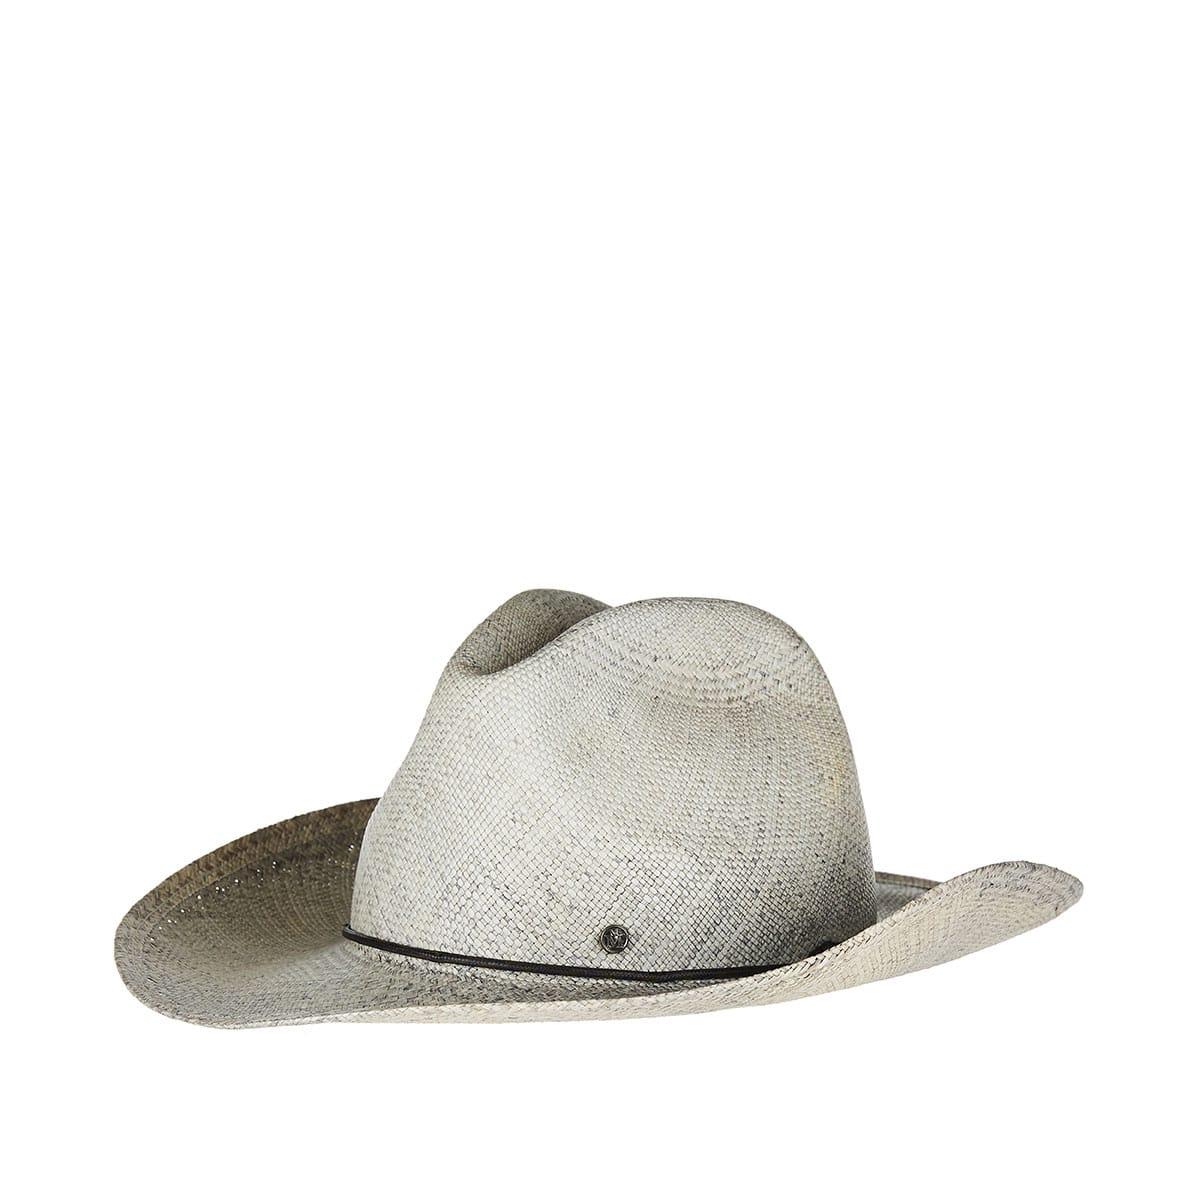 Austin, woven straw hat